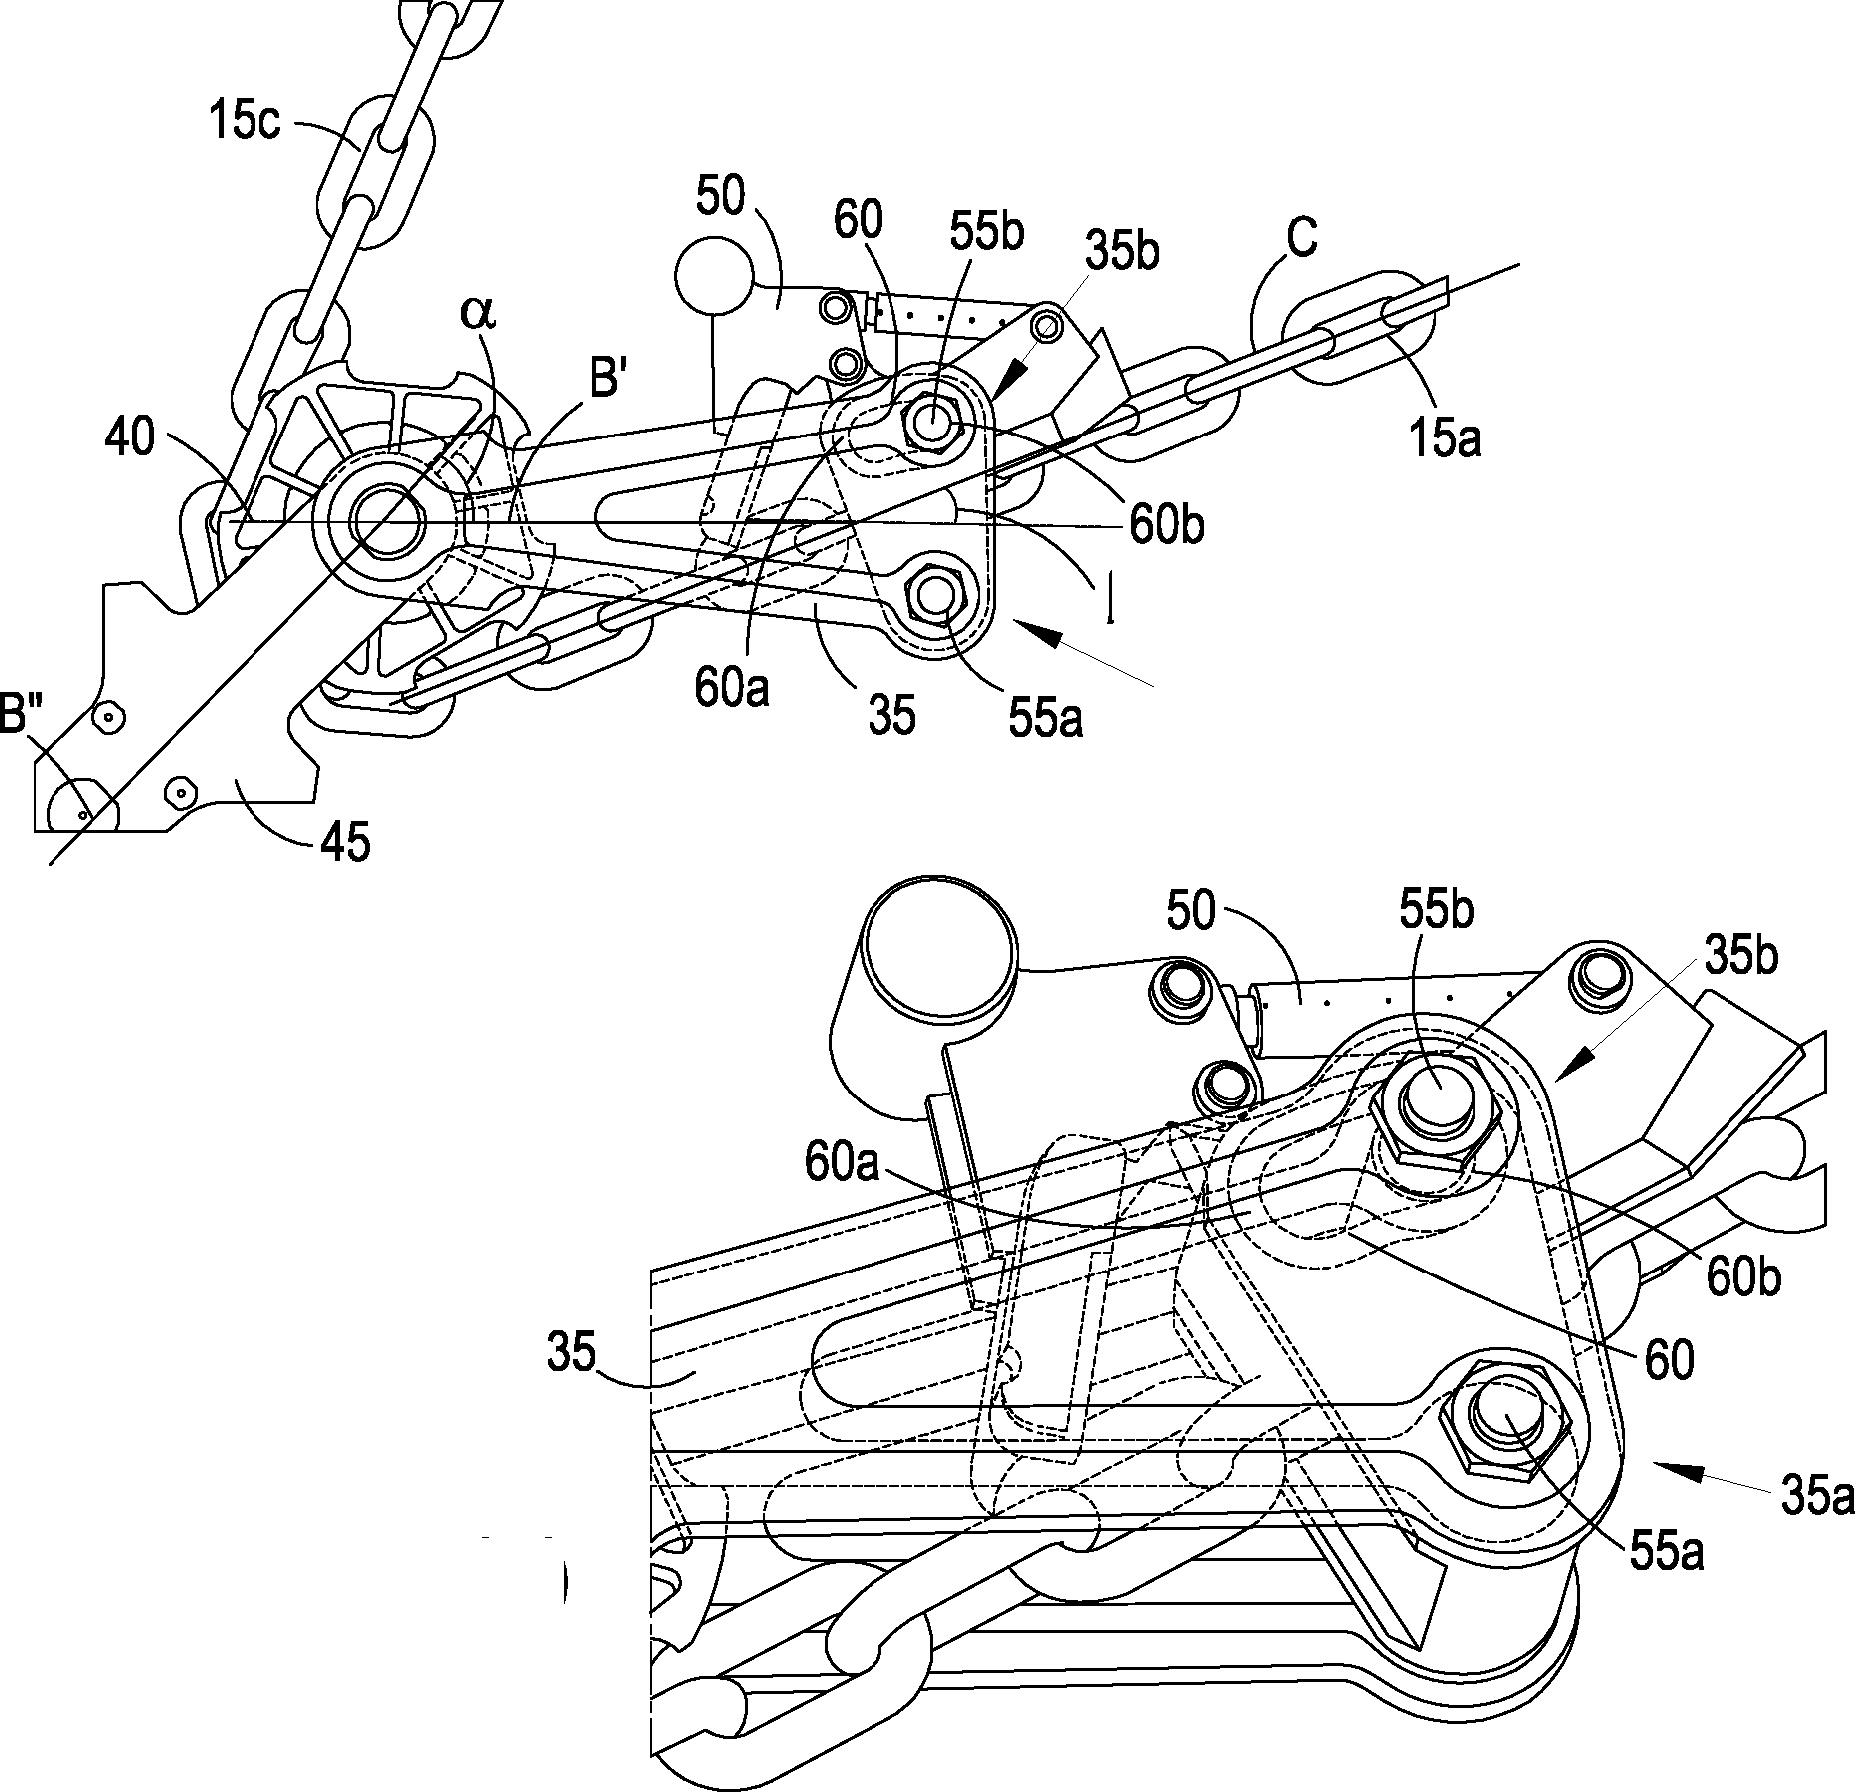 Figure GB2553499A_D0007